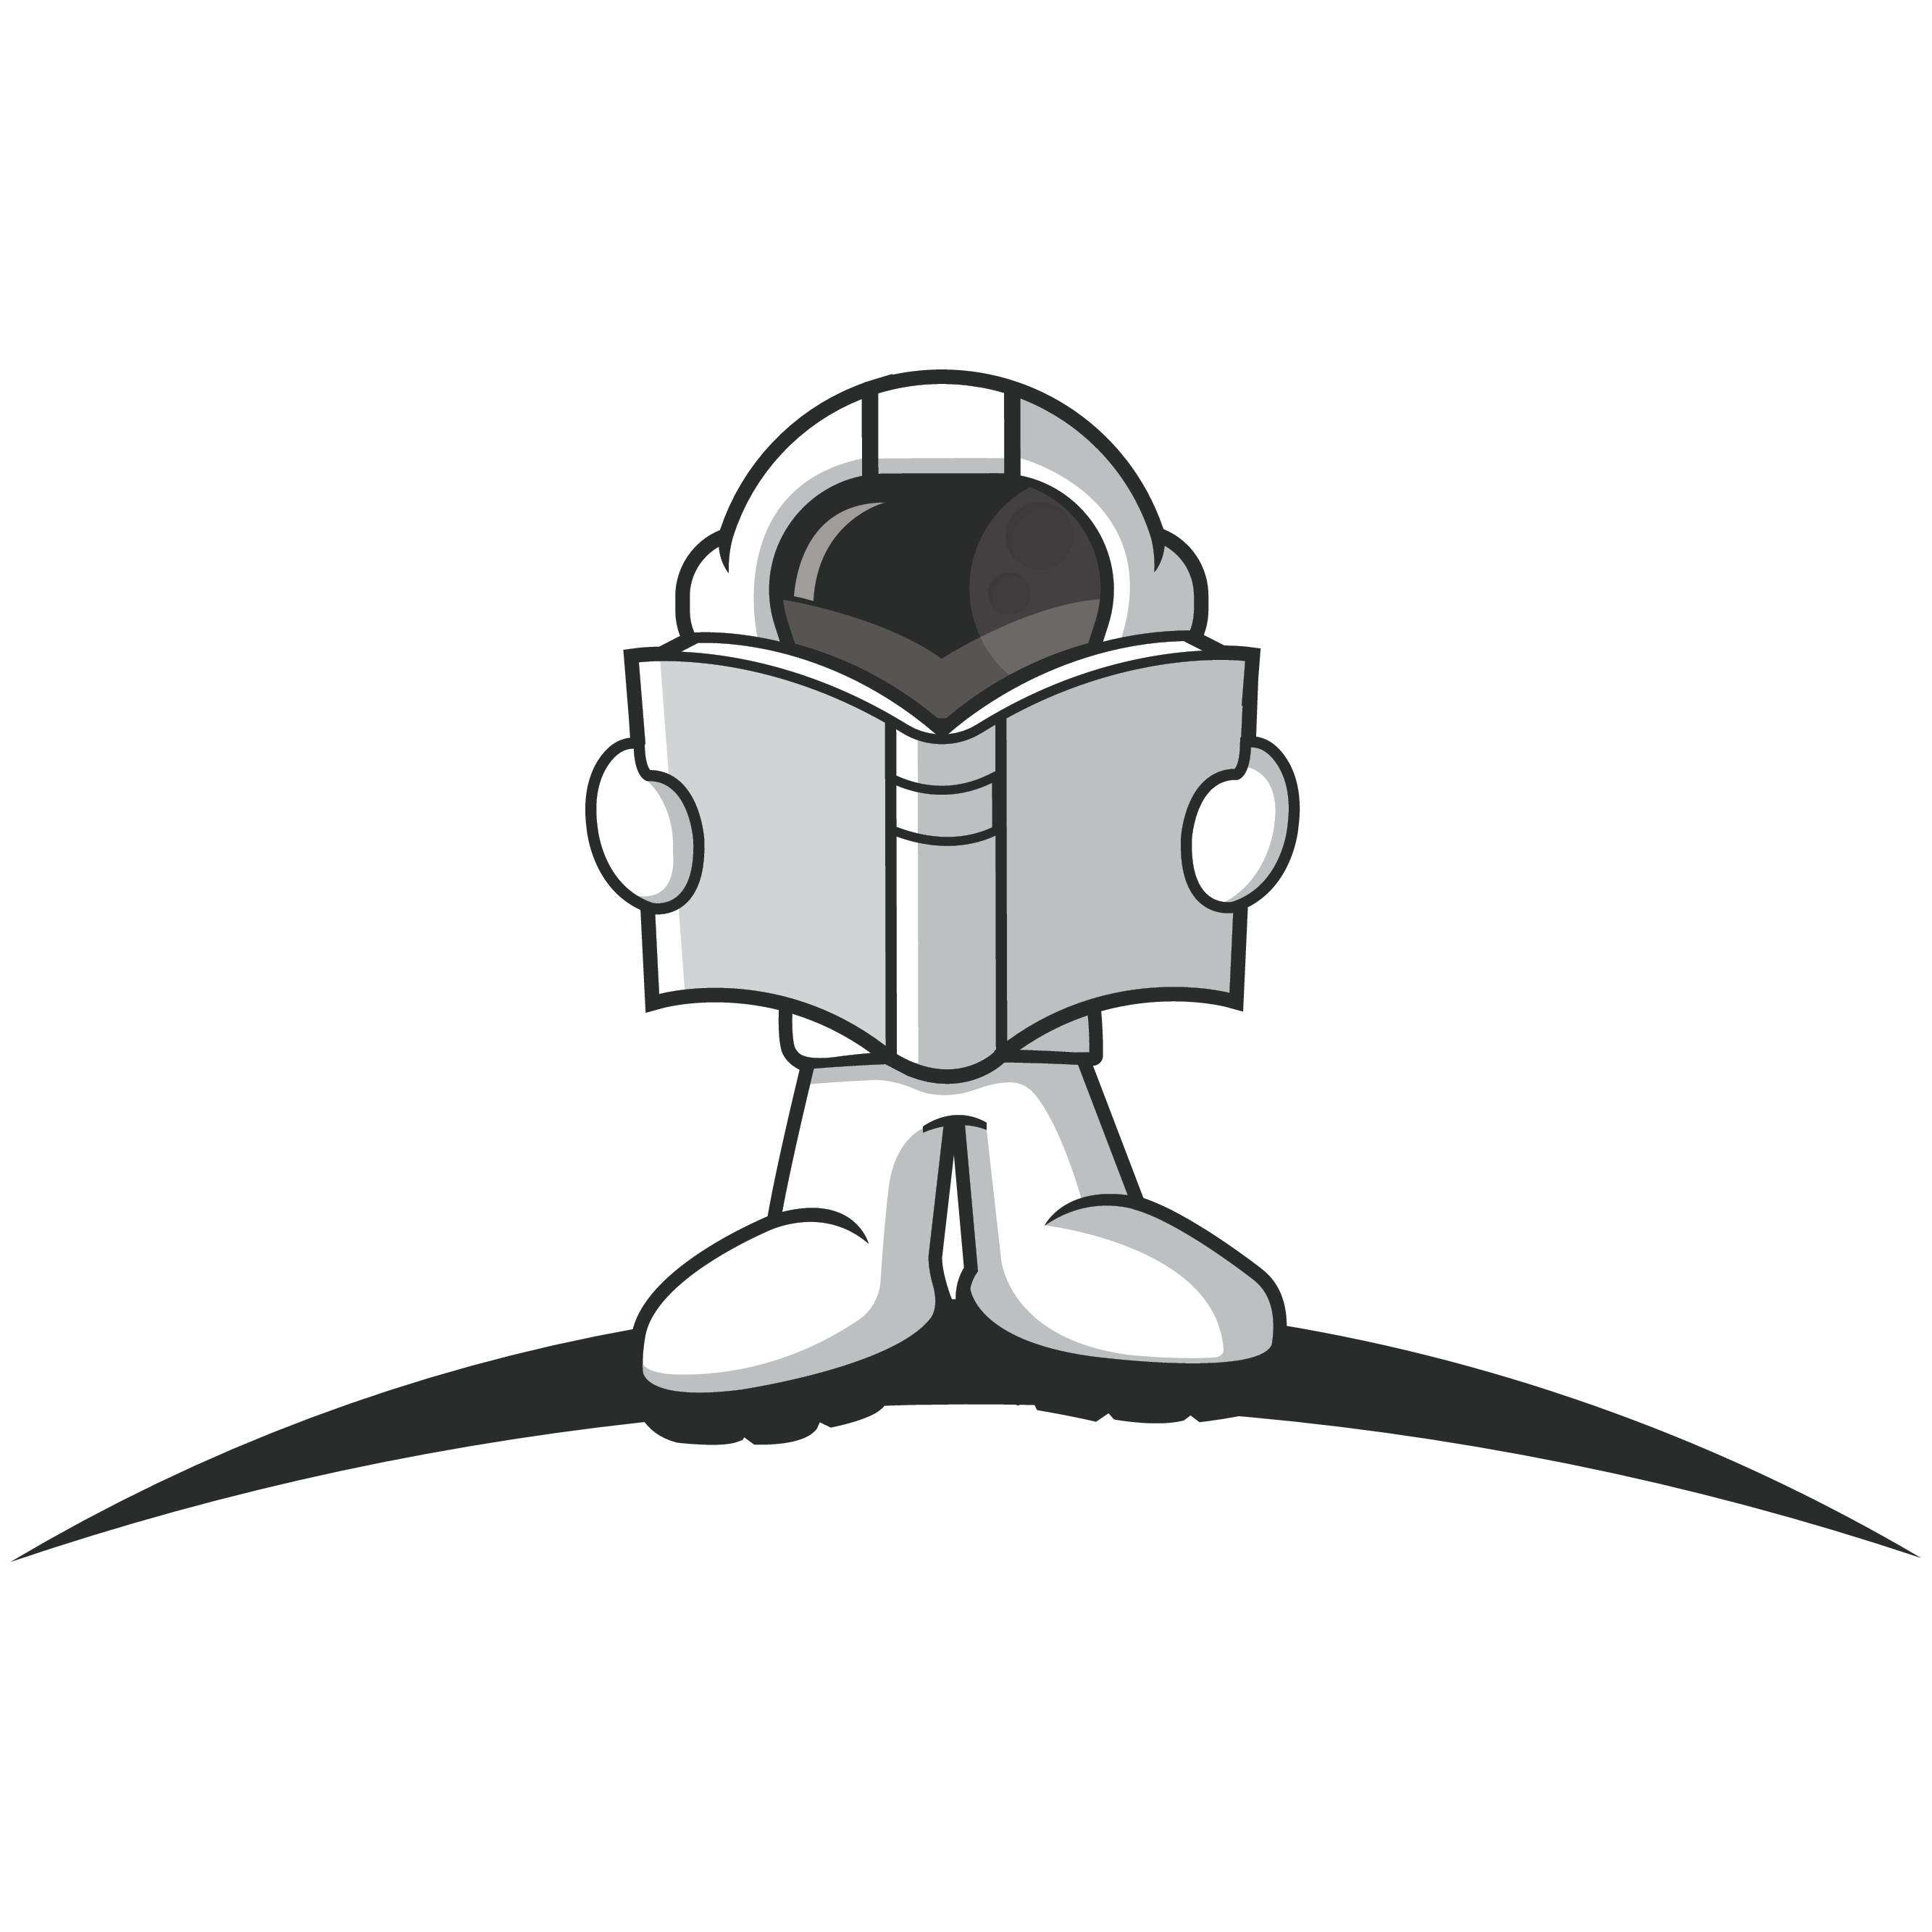 Create logo for RocketLit adaptive reading platform